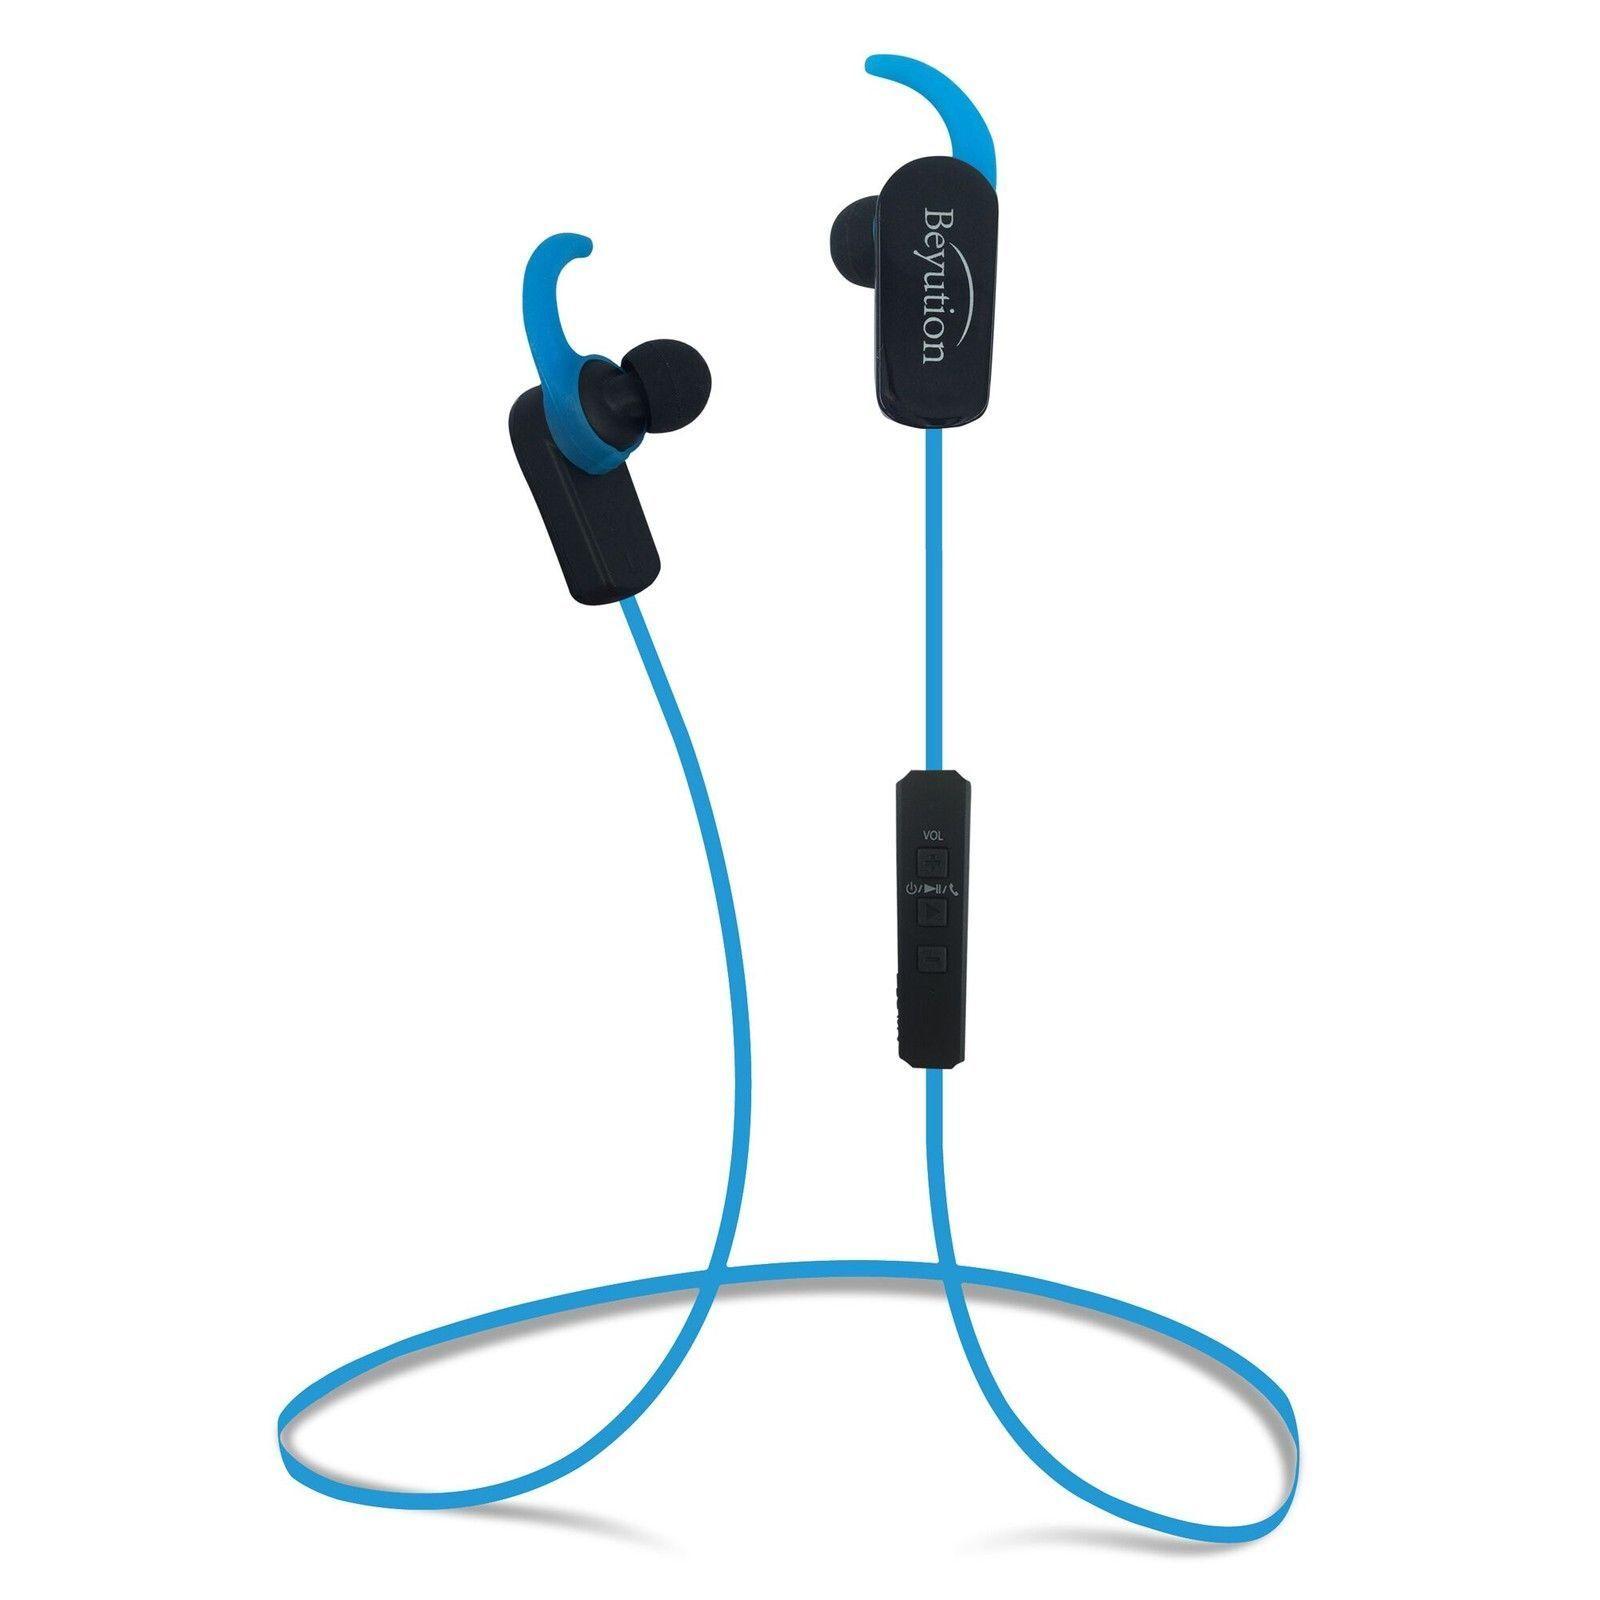 Beyution Wireless Bluetooth 4.1 Headphones Sport Earbuds w N